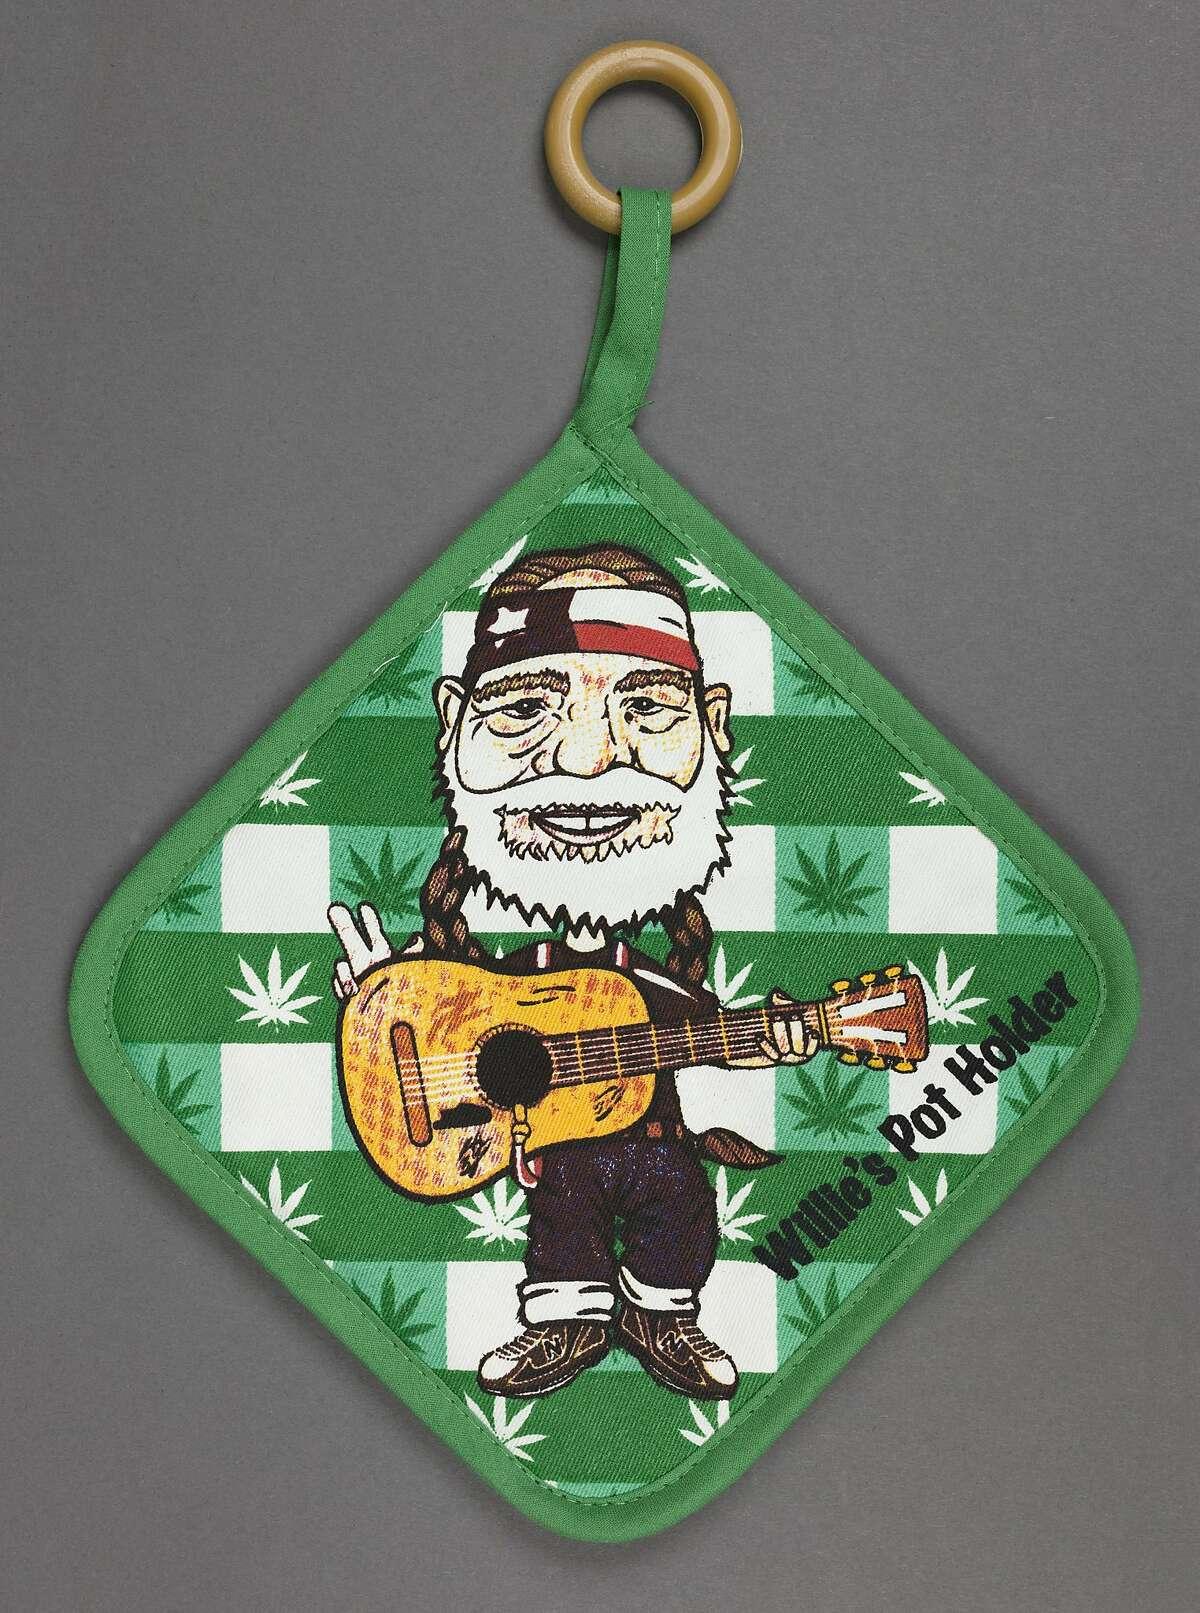 Willie Nelson tour merch pot holder